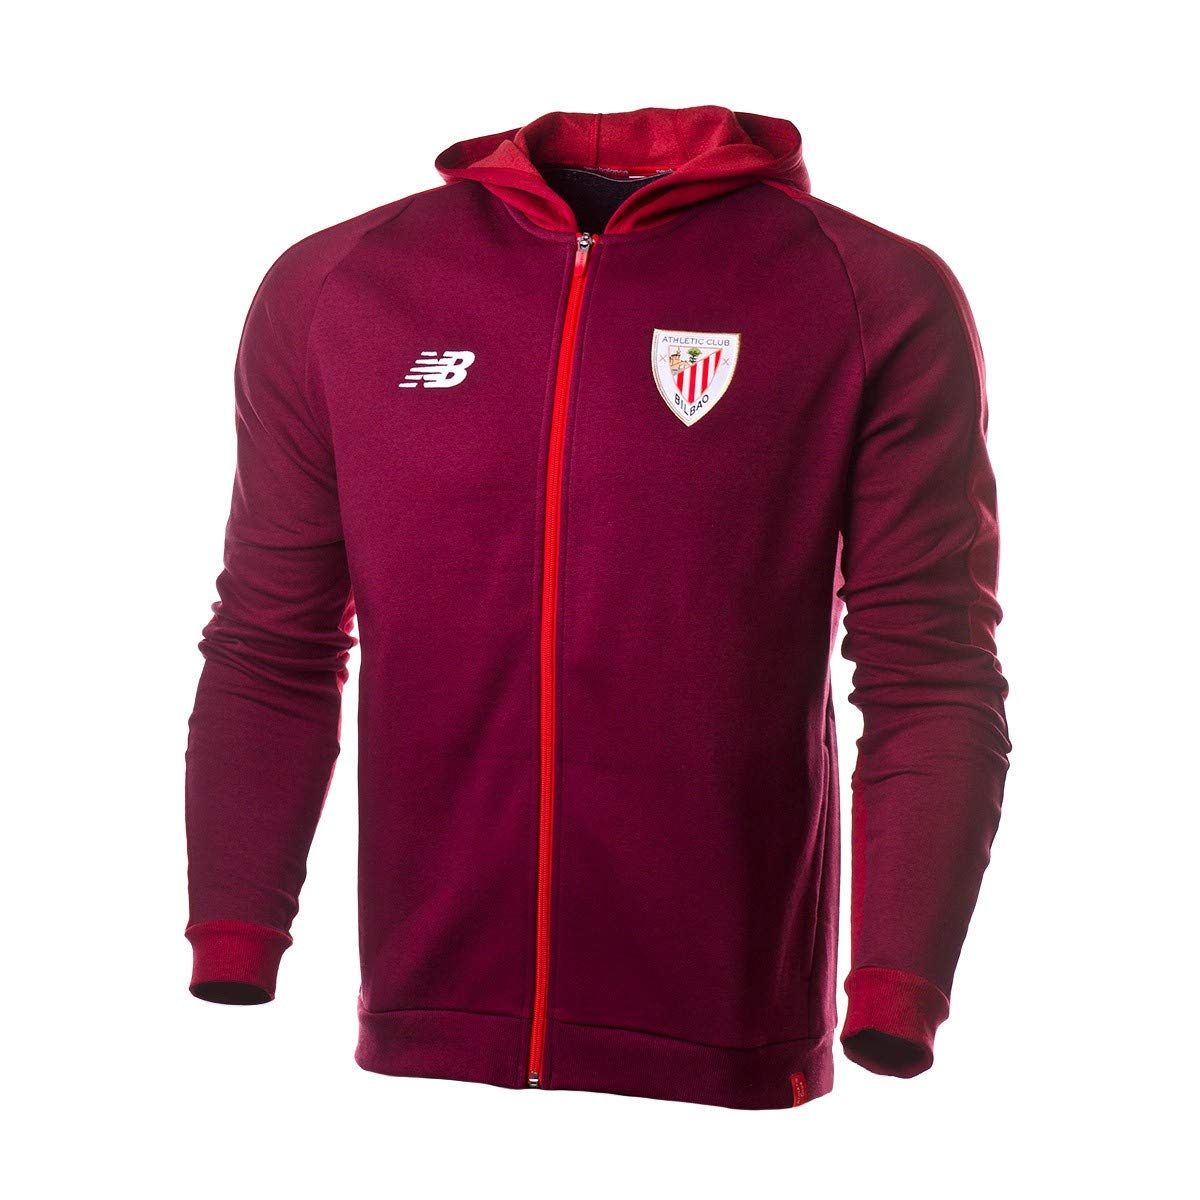 New Balance con Capucha AC Bilbao 2018-2019, Chaqueta, Garnet ...